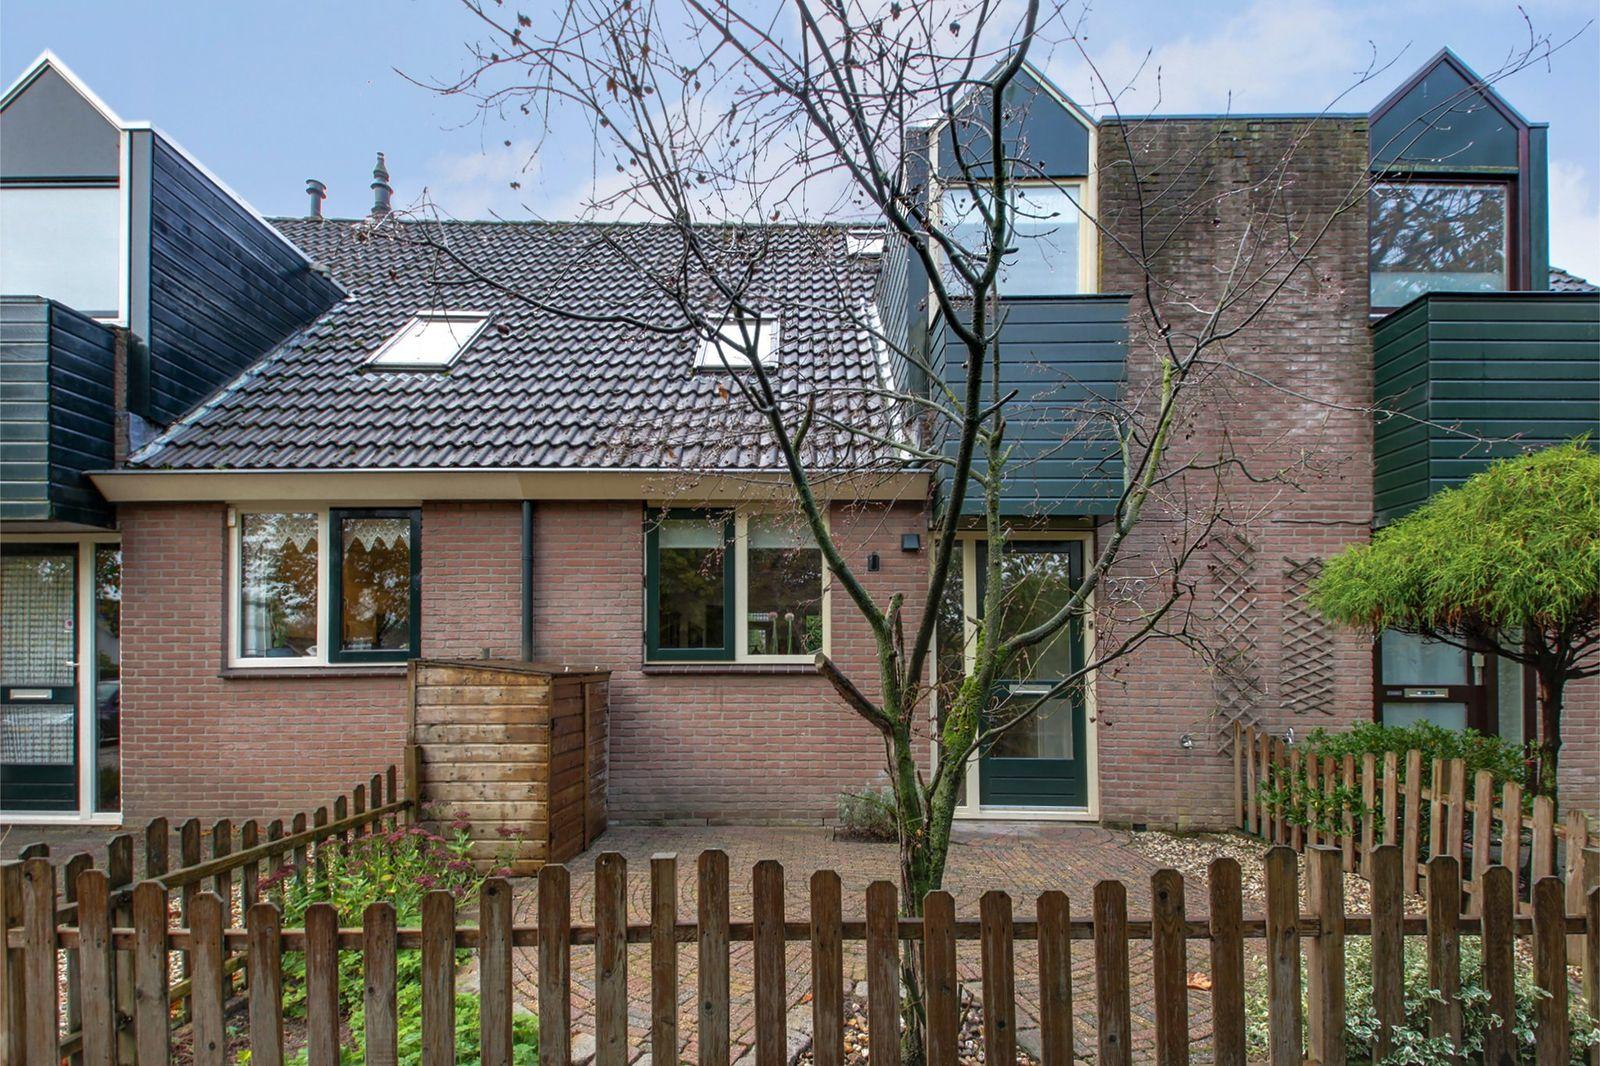 Willem Dreeslaan 269, Epe